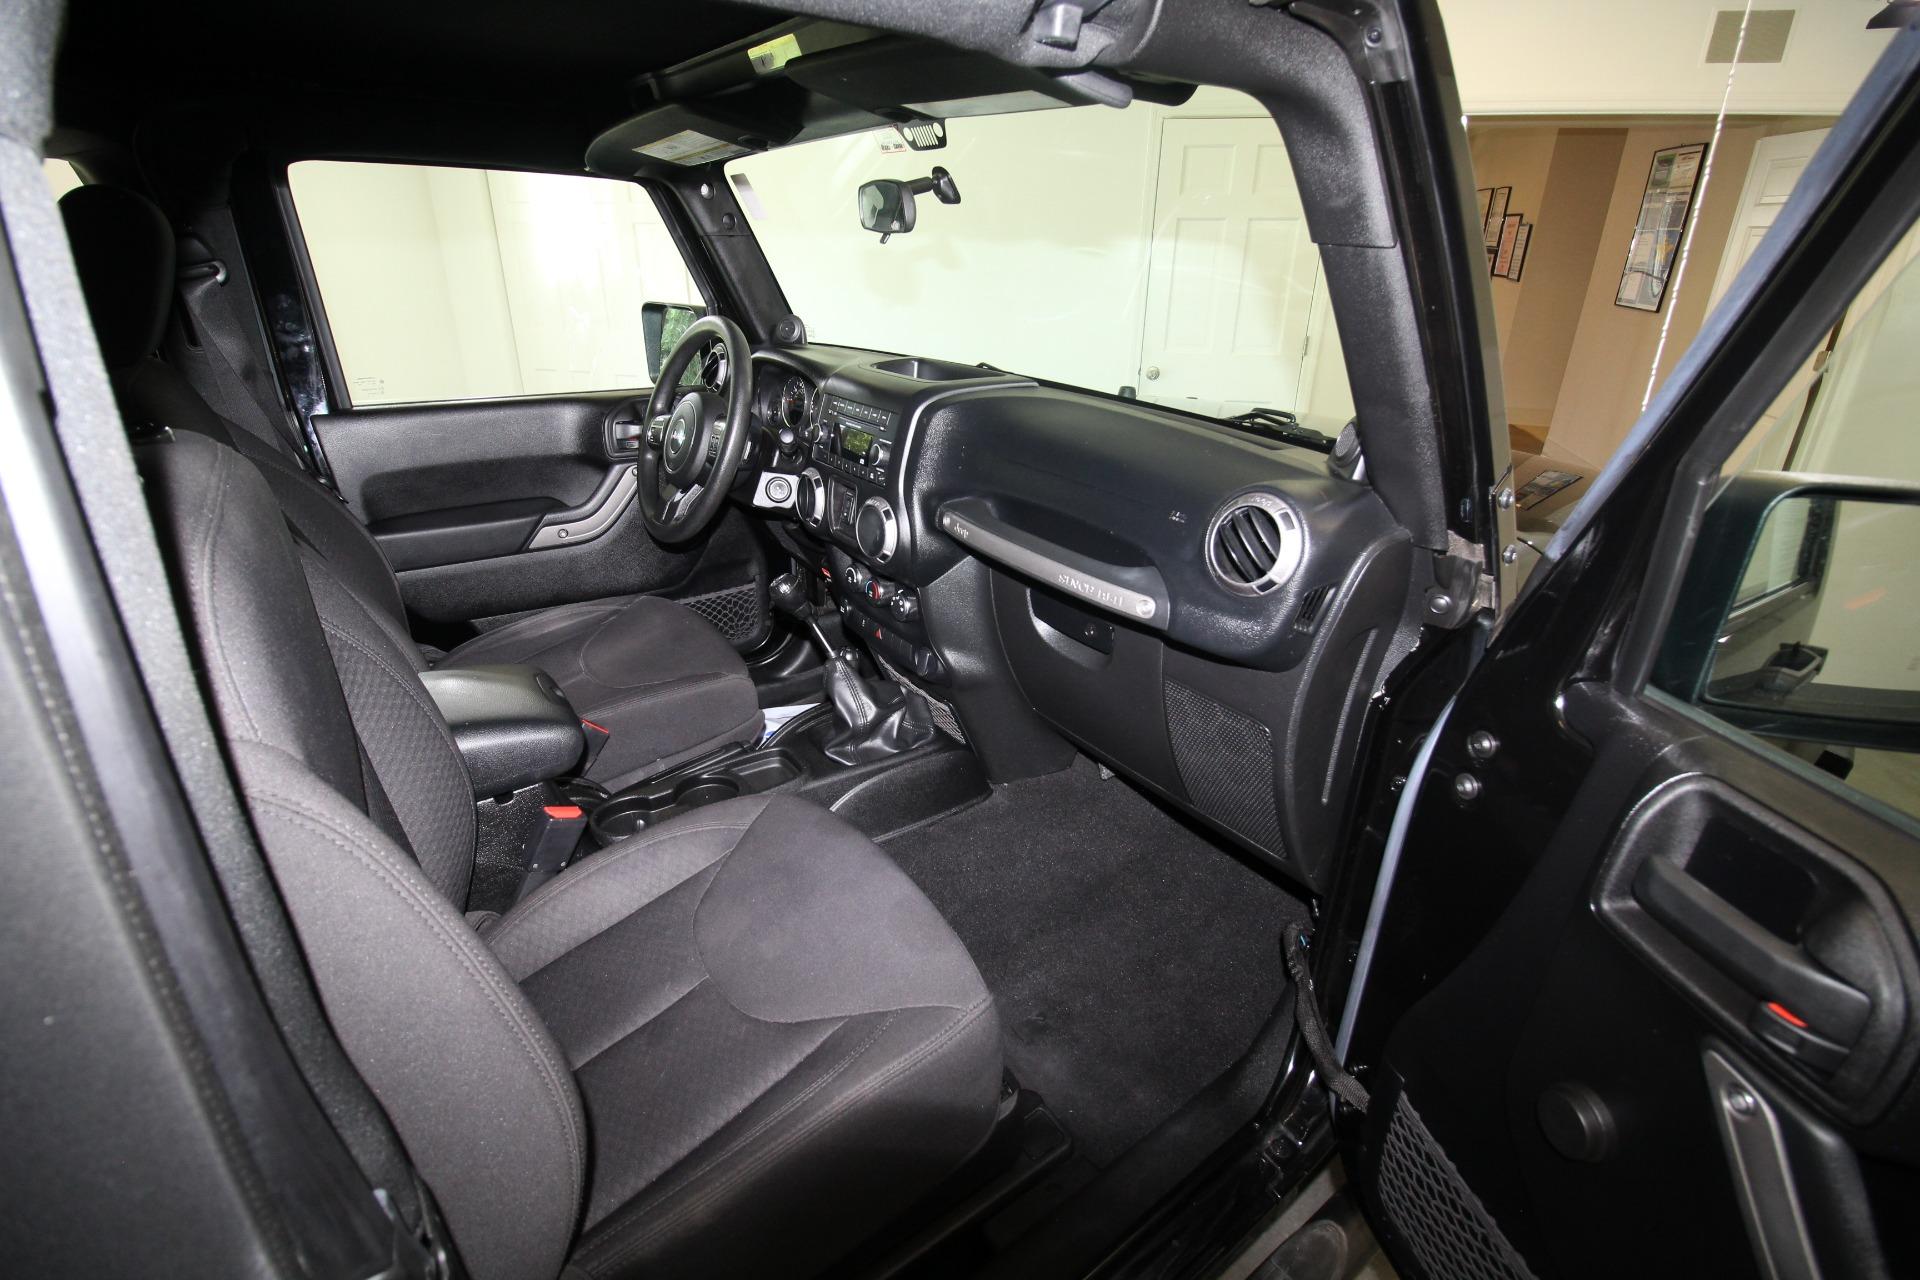 Used 2013 Jeep Wrangler Sport 4WD SUPER LOW MILES SUPER CLEAN SAHARA WHEELS | Albany, NY